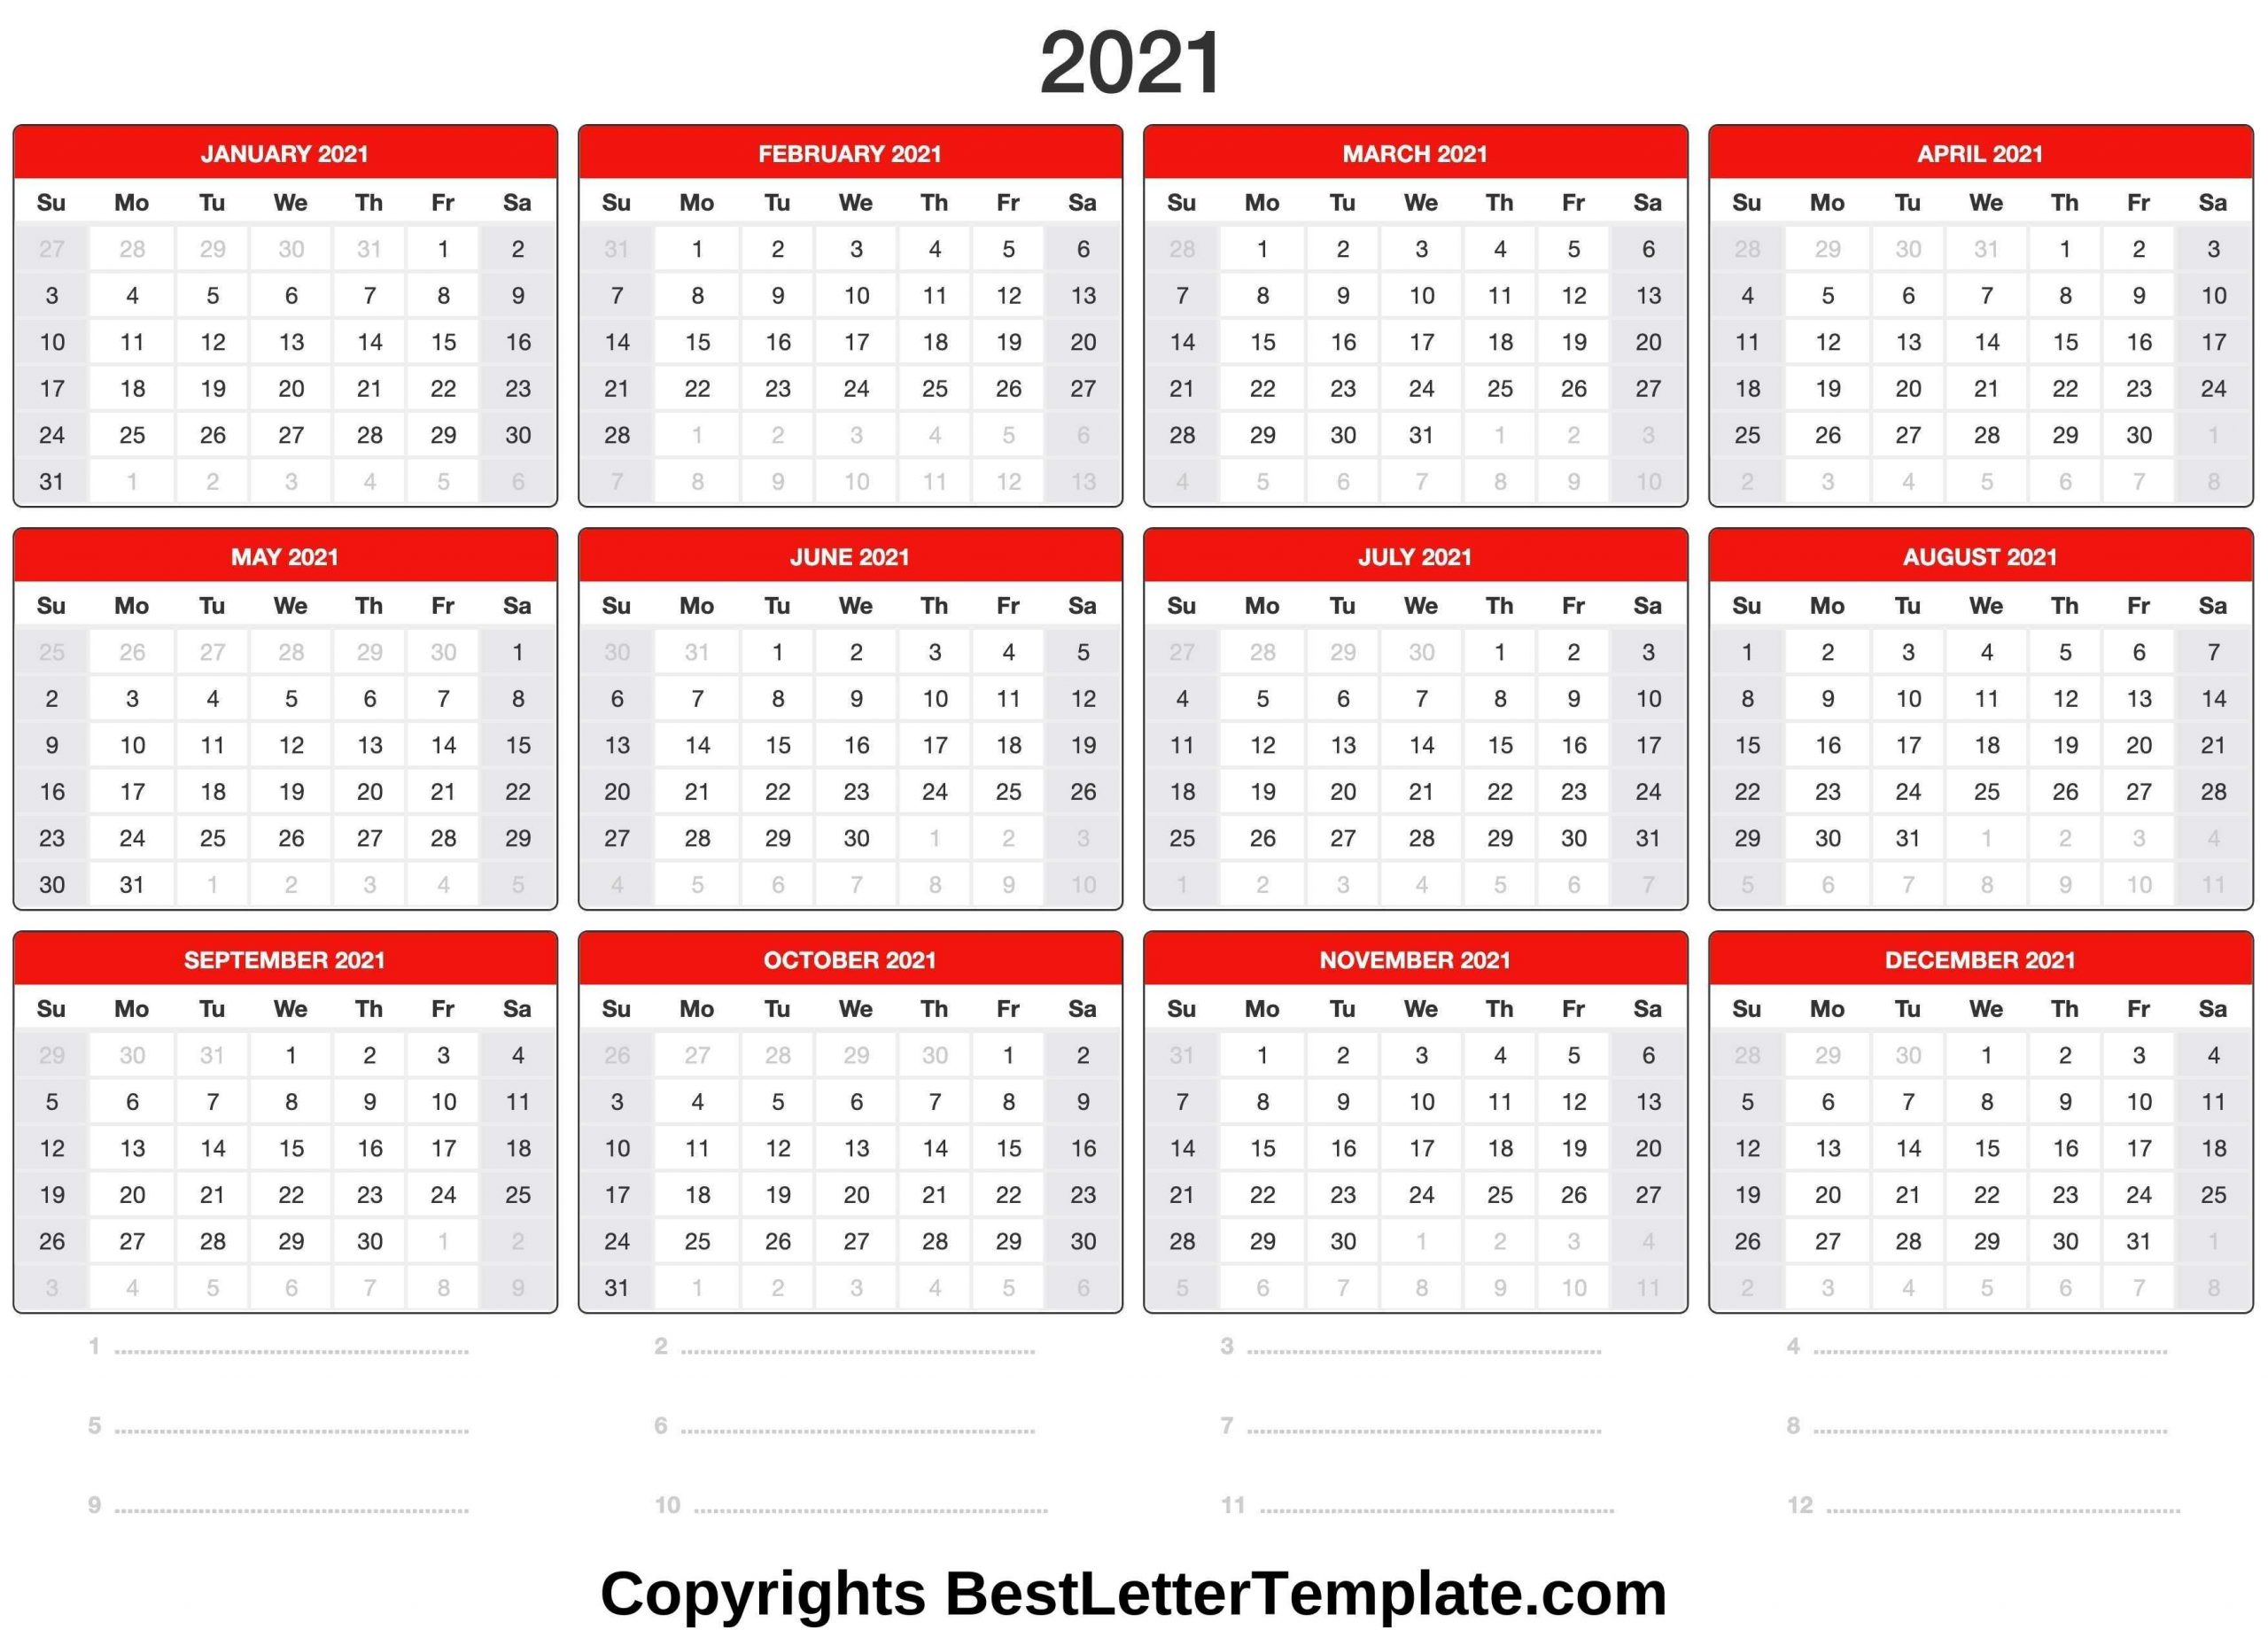 Blank Printable Calendar 2021 Best Letter Template